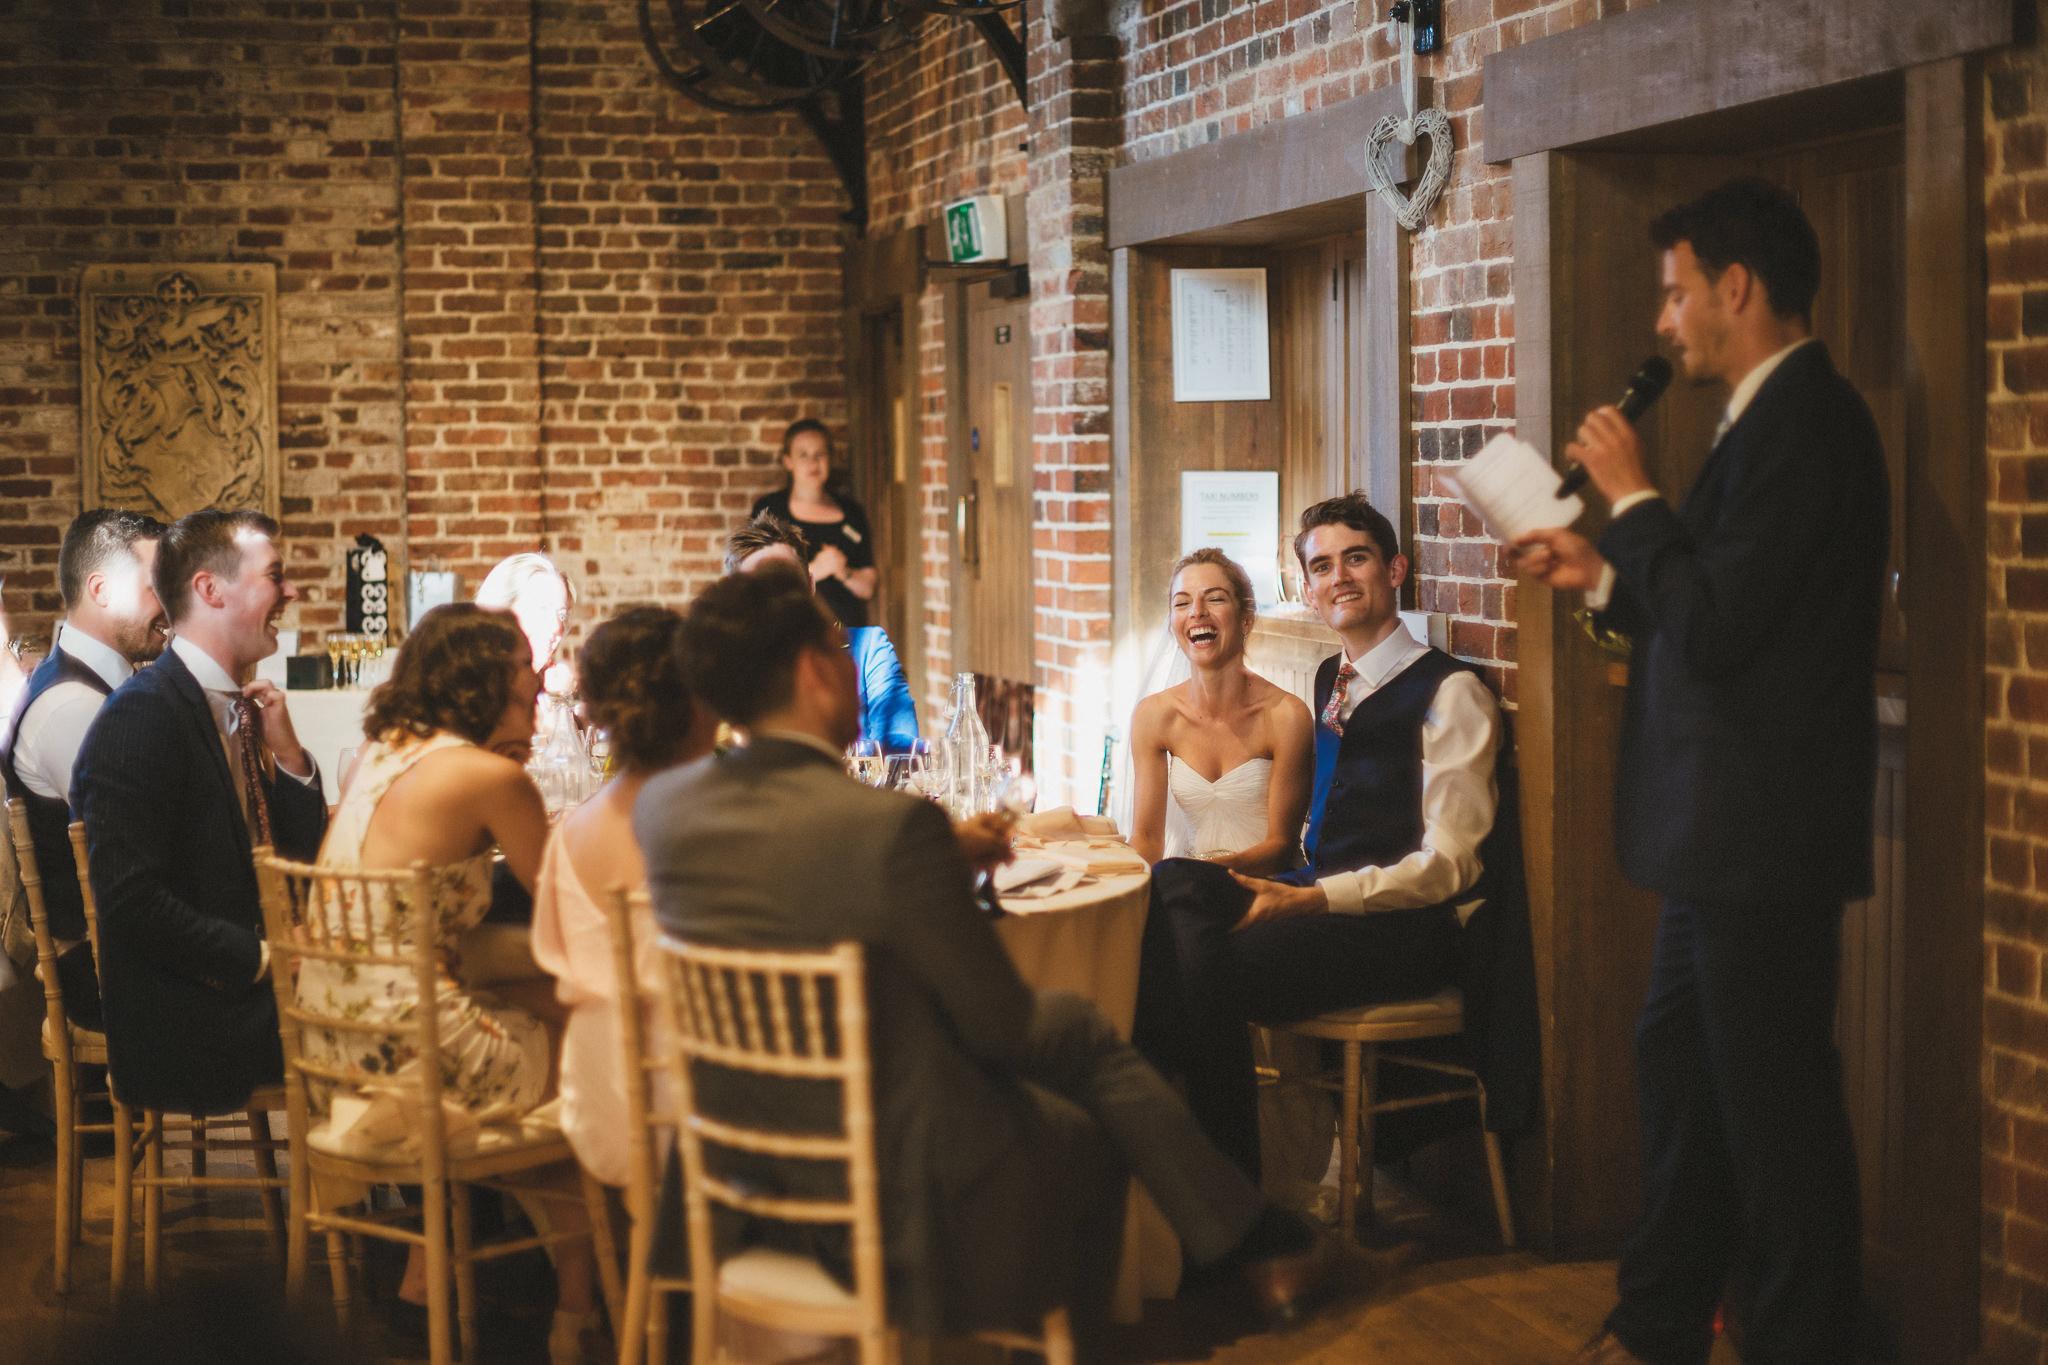 paul-marbrook-Gaynes-Park Wedding-Photographer-90121